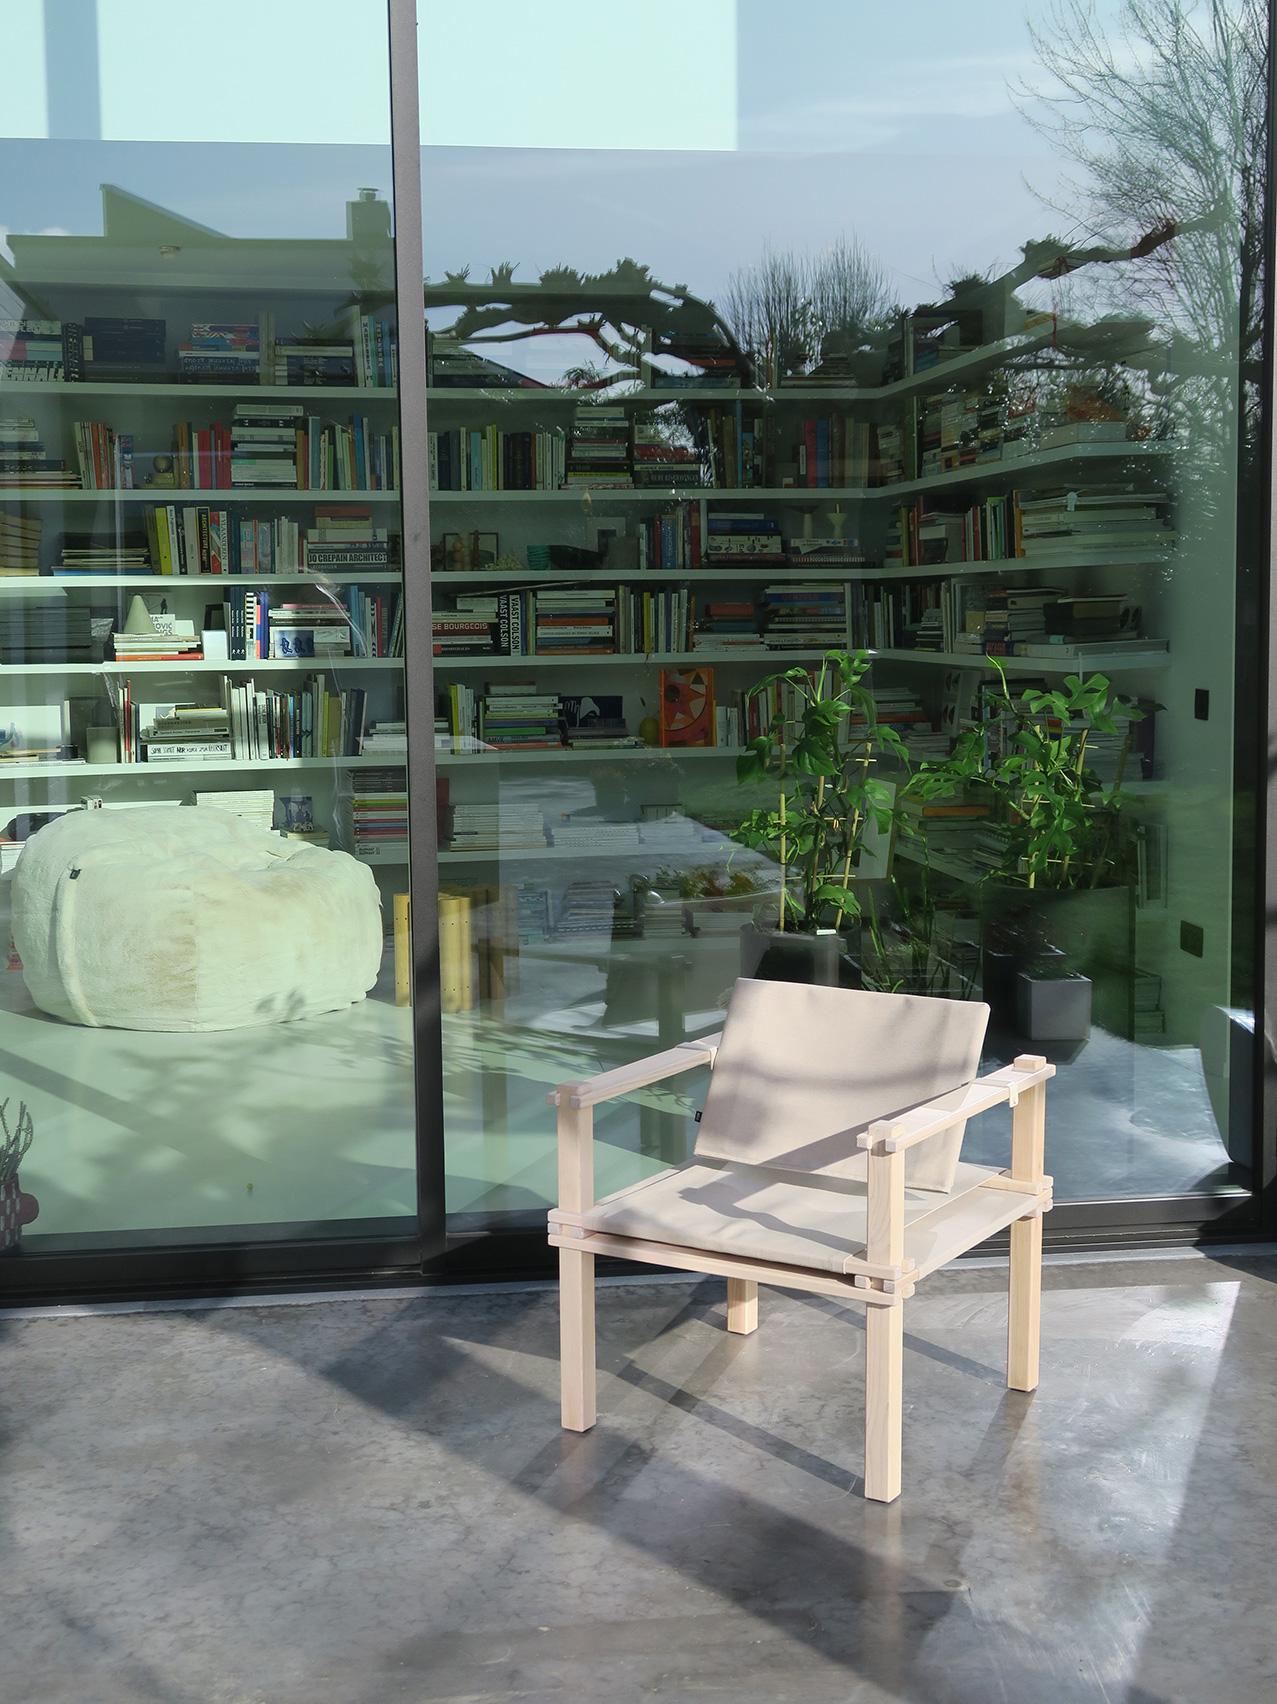 maatwerk gebogen boekenrek-vetsak-zigzag stoel van Gerrit Rietveld/magnetwood table van Raphael Charles-in/outdoor stoel famer van Gerd Lange